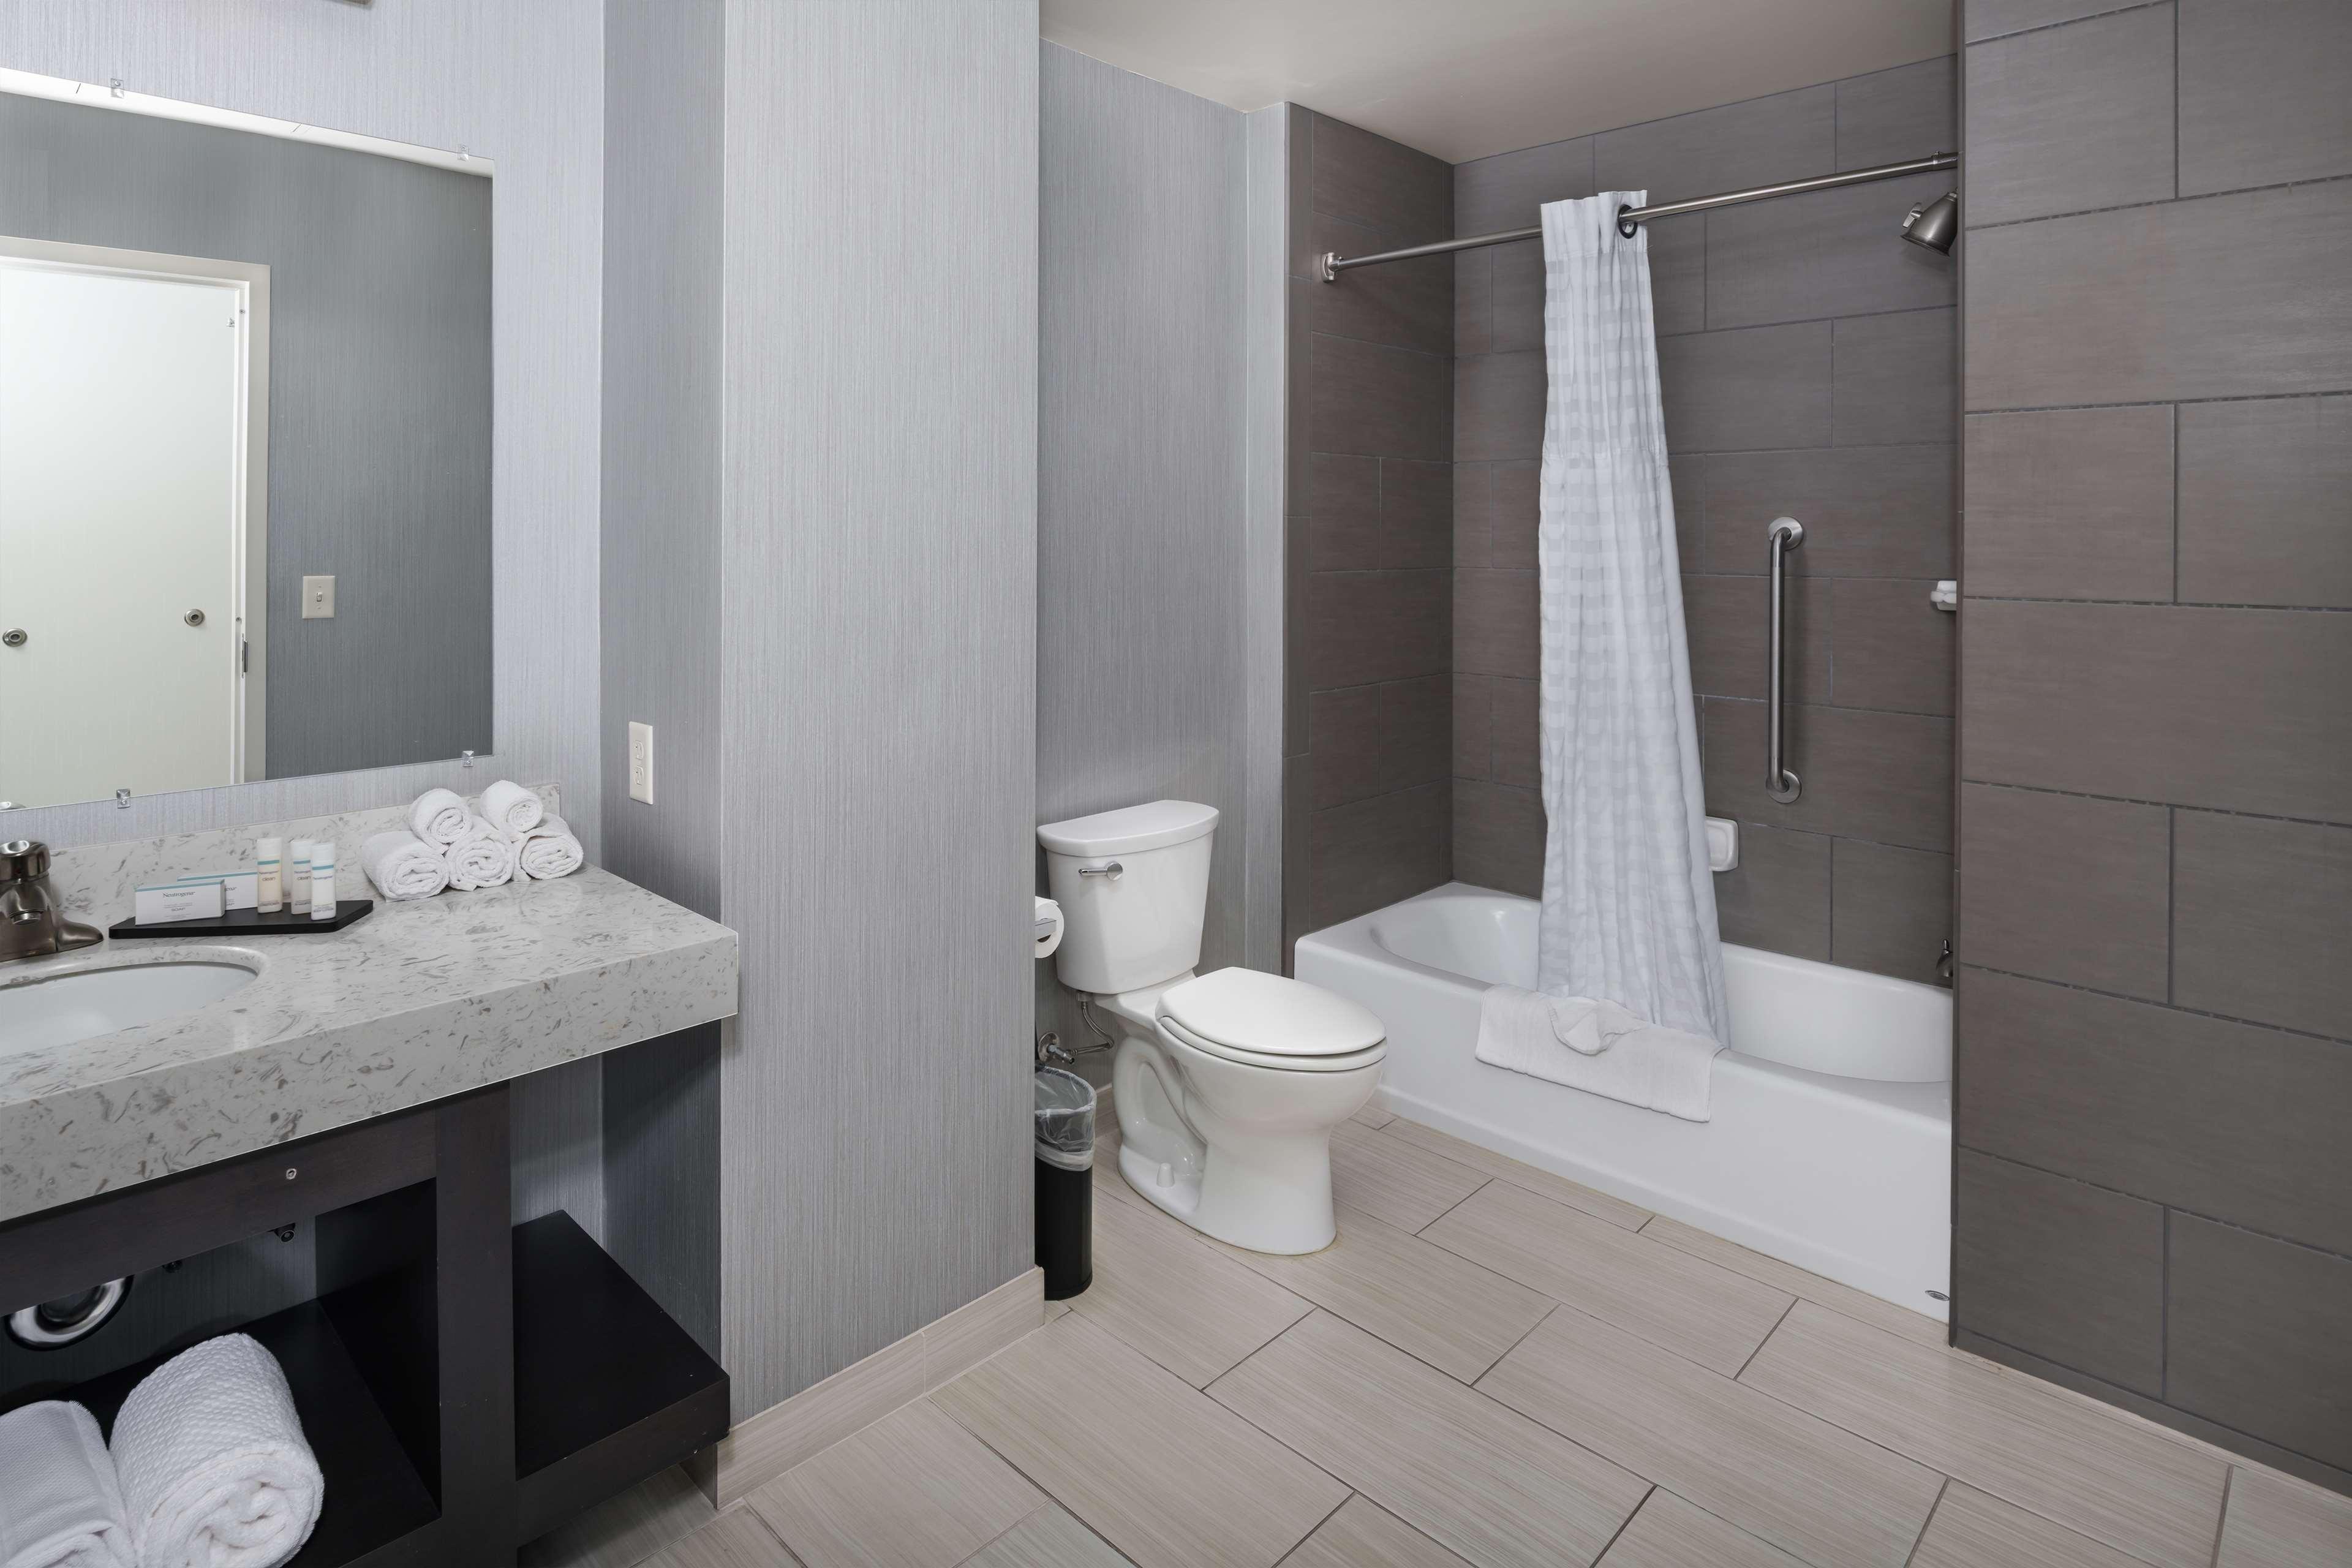 Embassy Suites by Hilton Portland Hillsboro, Oregon image 16